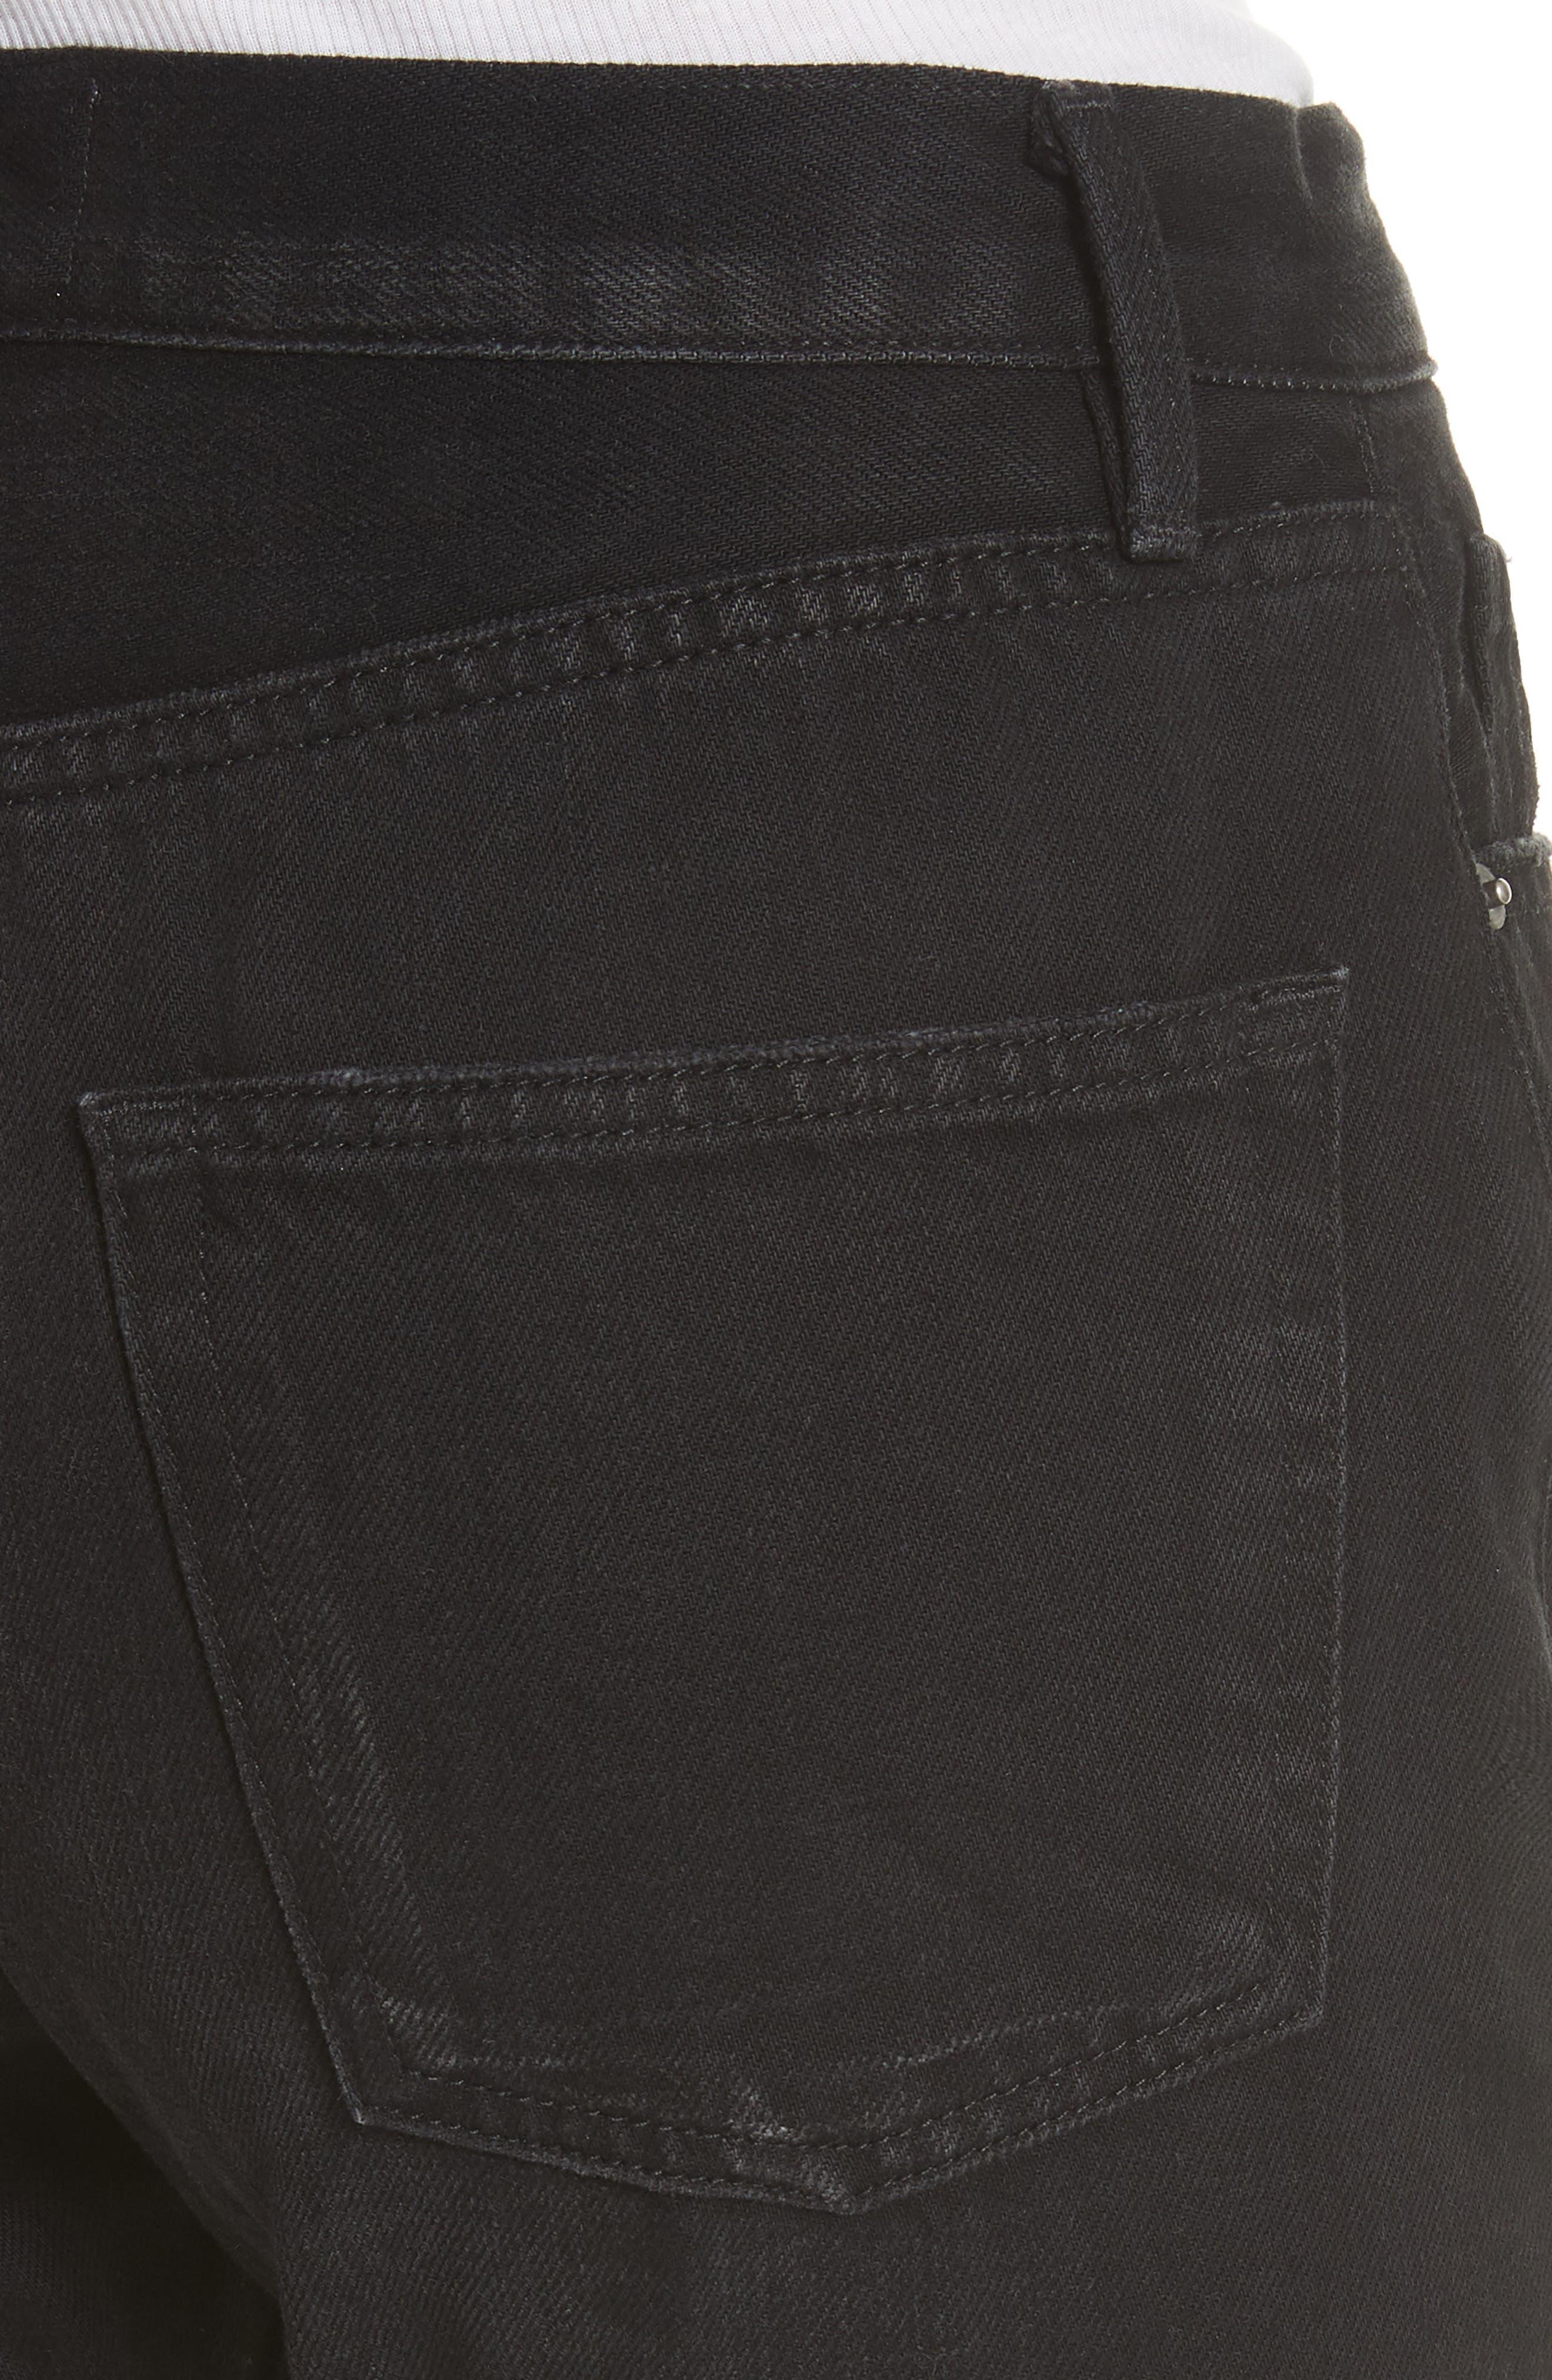 Le Original Released Hem High Waist Jeans,                             Alternate thumbnail 4, color,                             Grey River